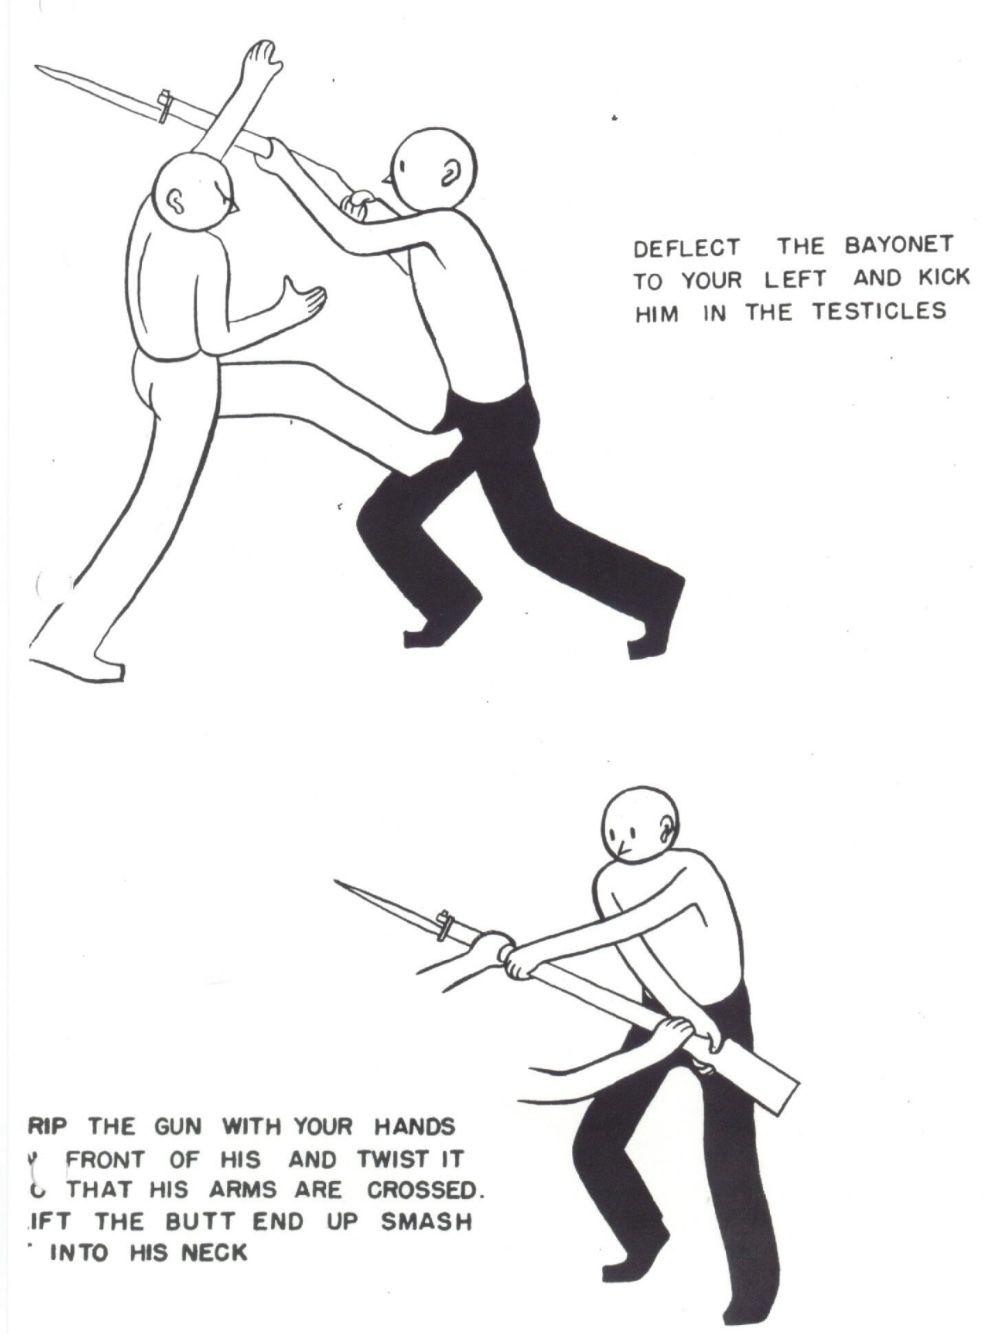 Fight techniques image by Samrath Singh on marital arts